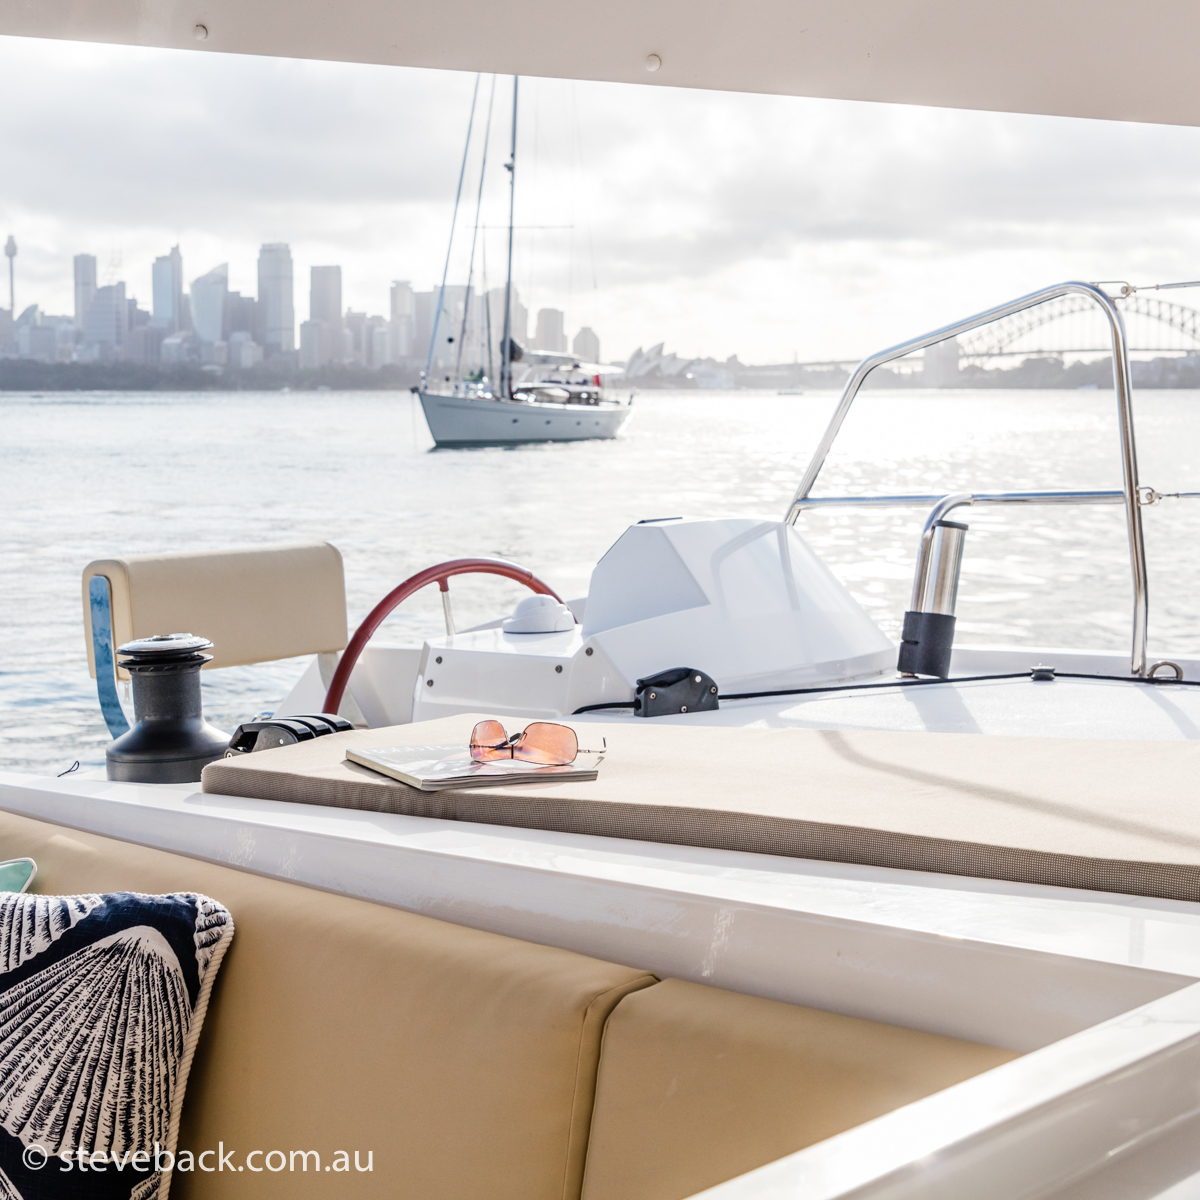 Anyboat-catamaran-Nordic-dream-maritime-boat-photography-04.jpg